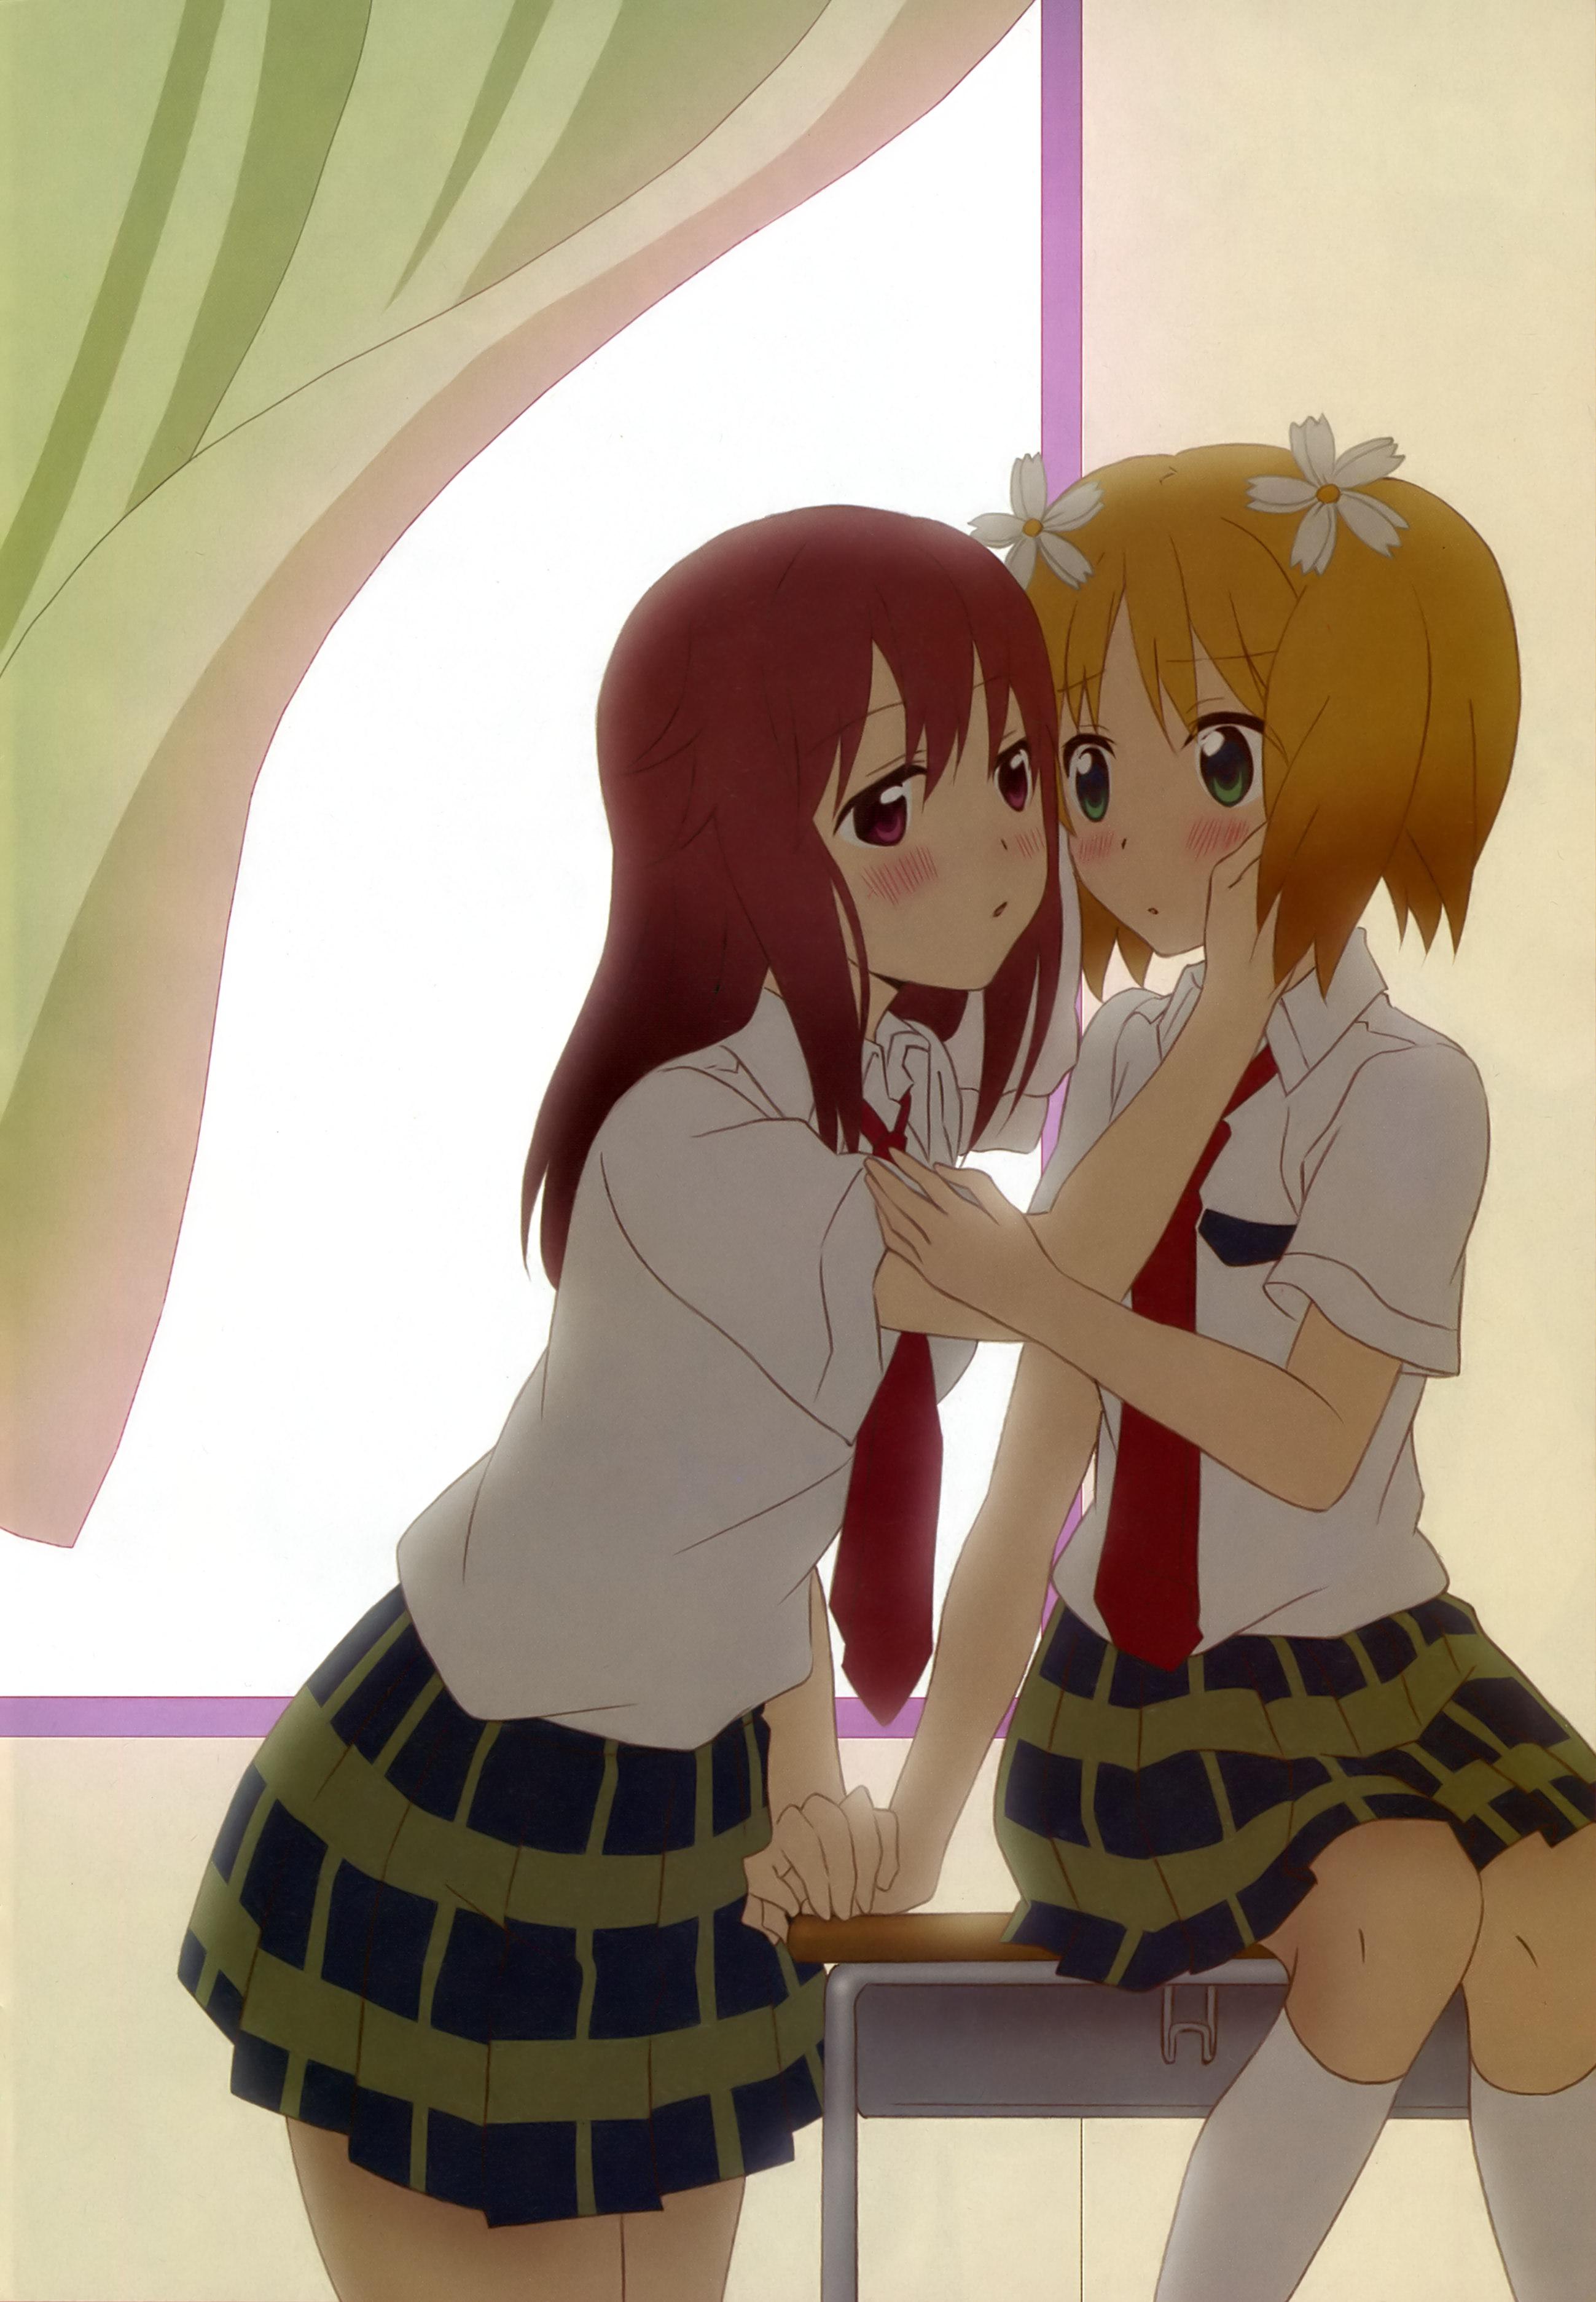 Sakura Trick Image #1669111 - Zerochan Anime Image Board